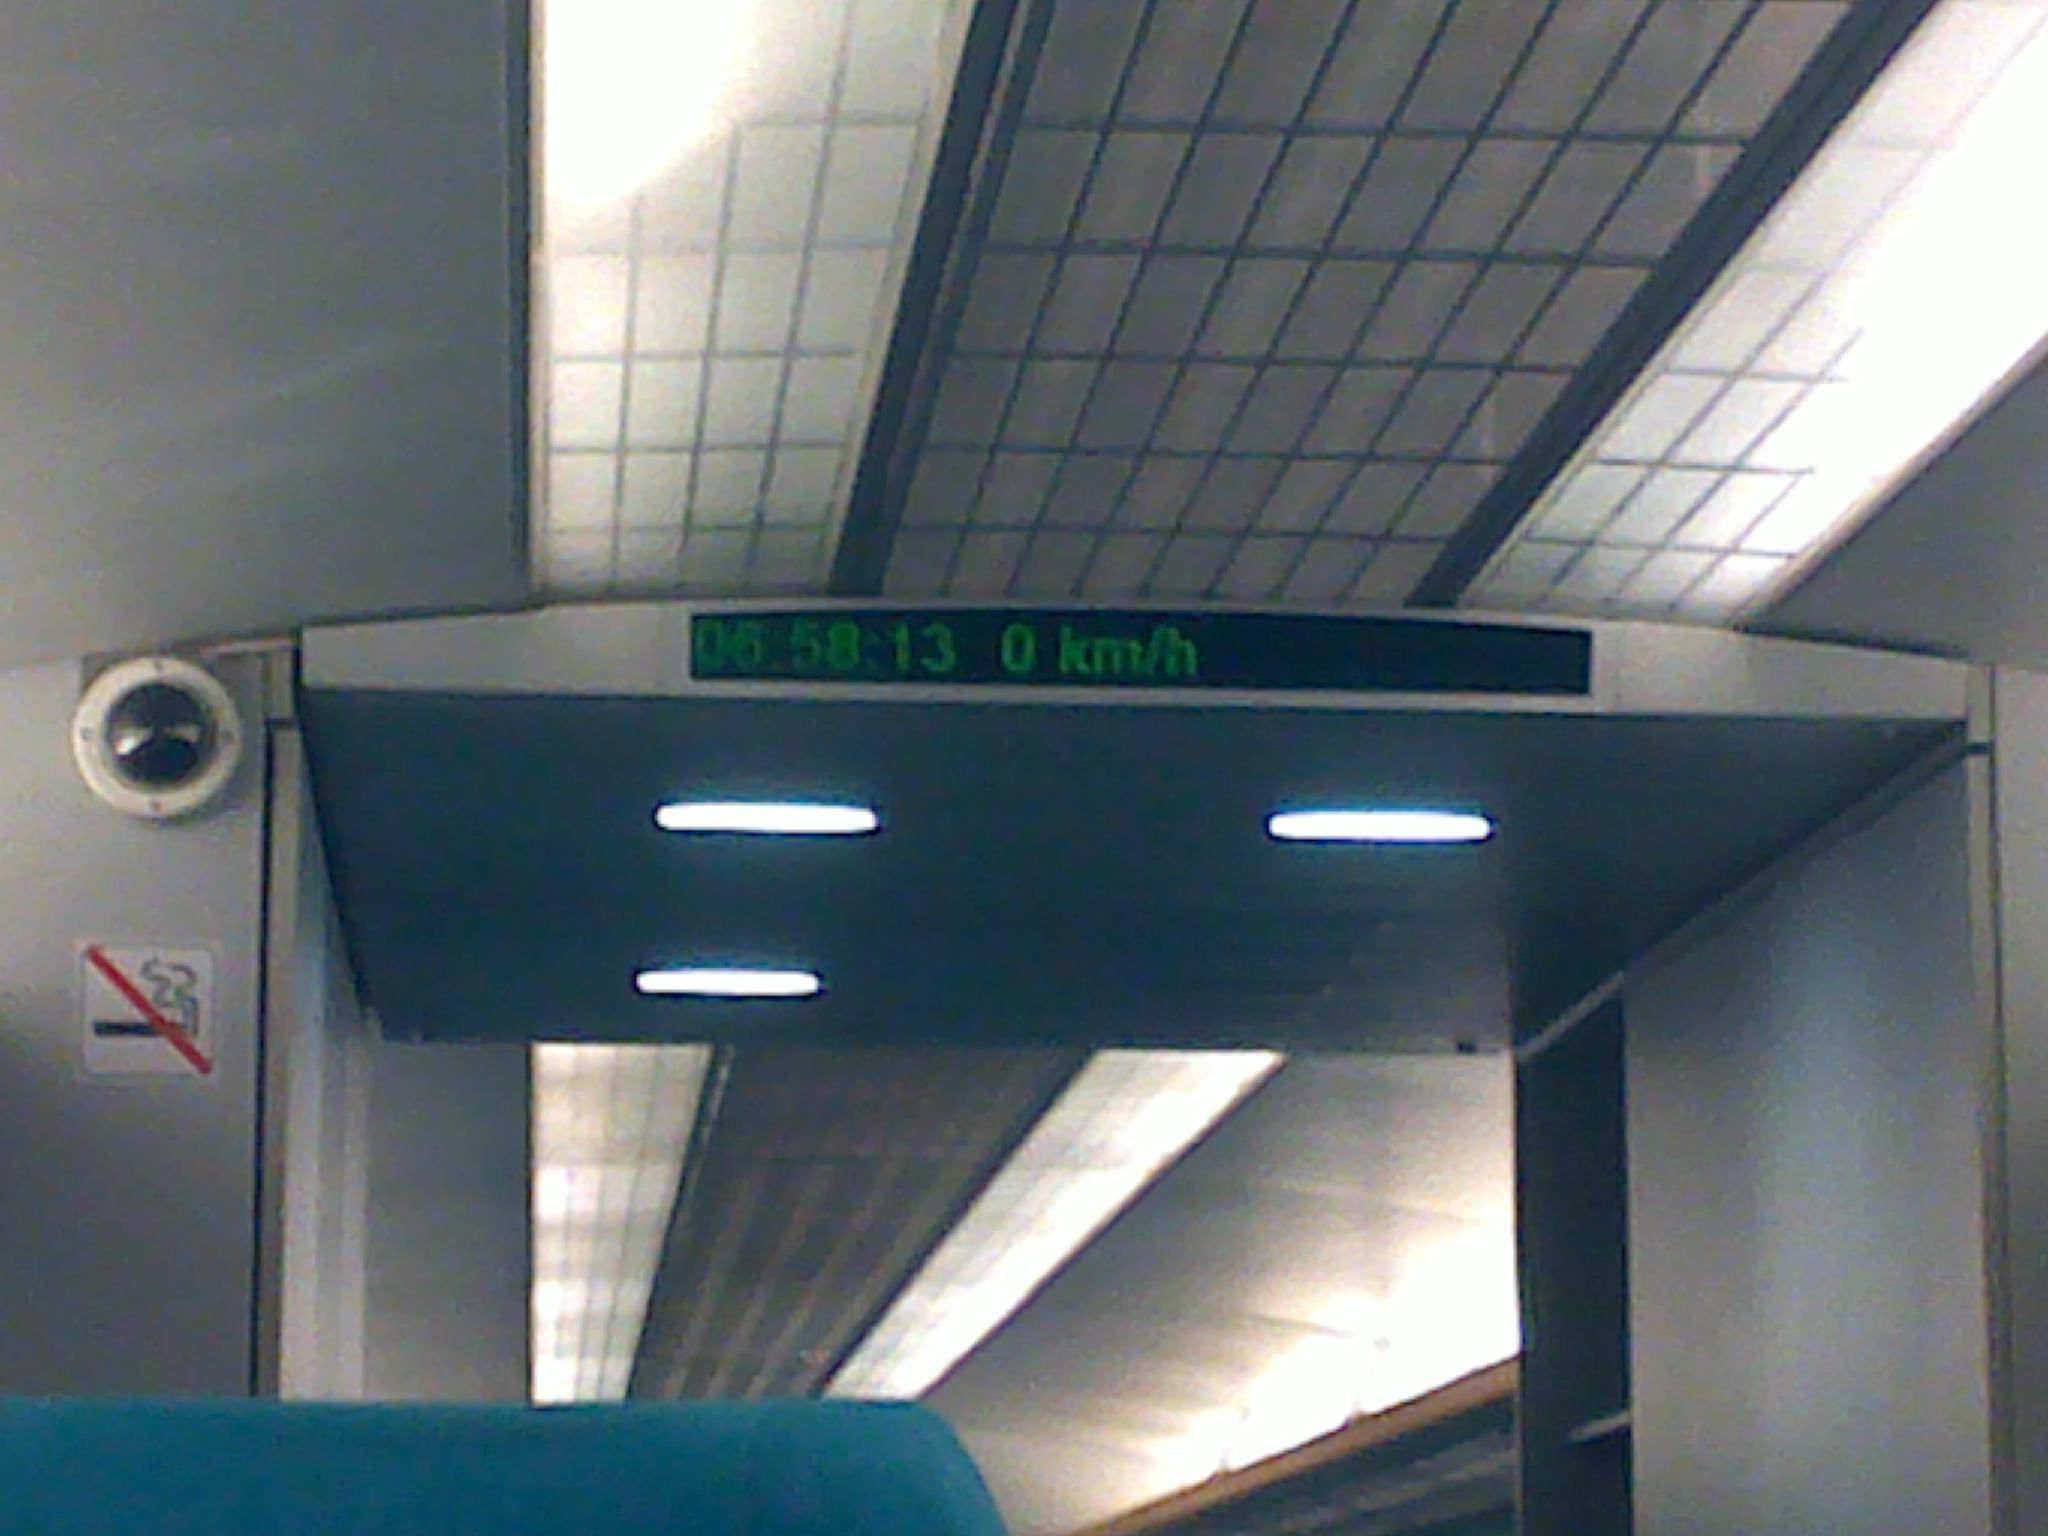 Inside Stopped Maglev Train